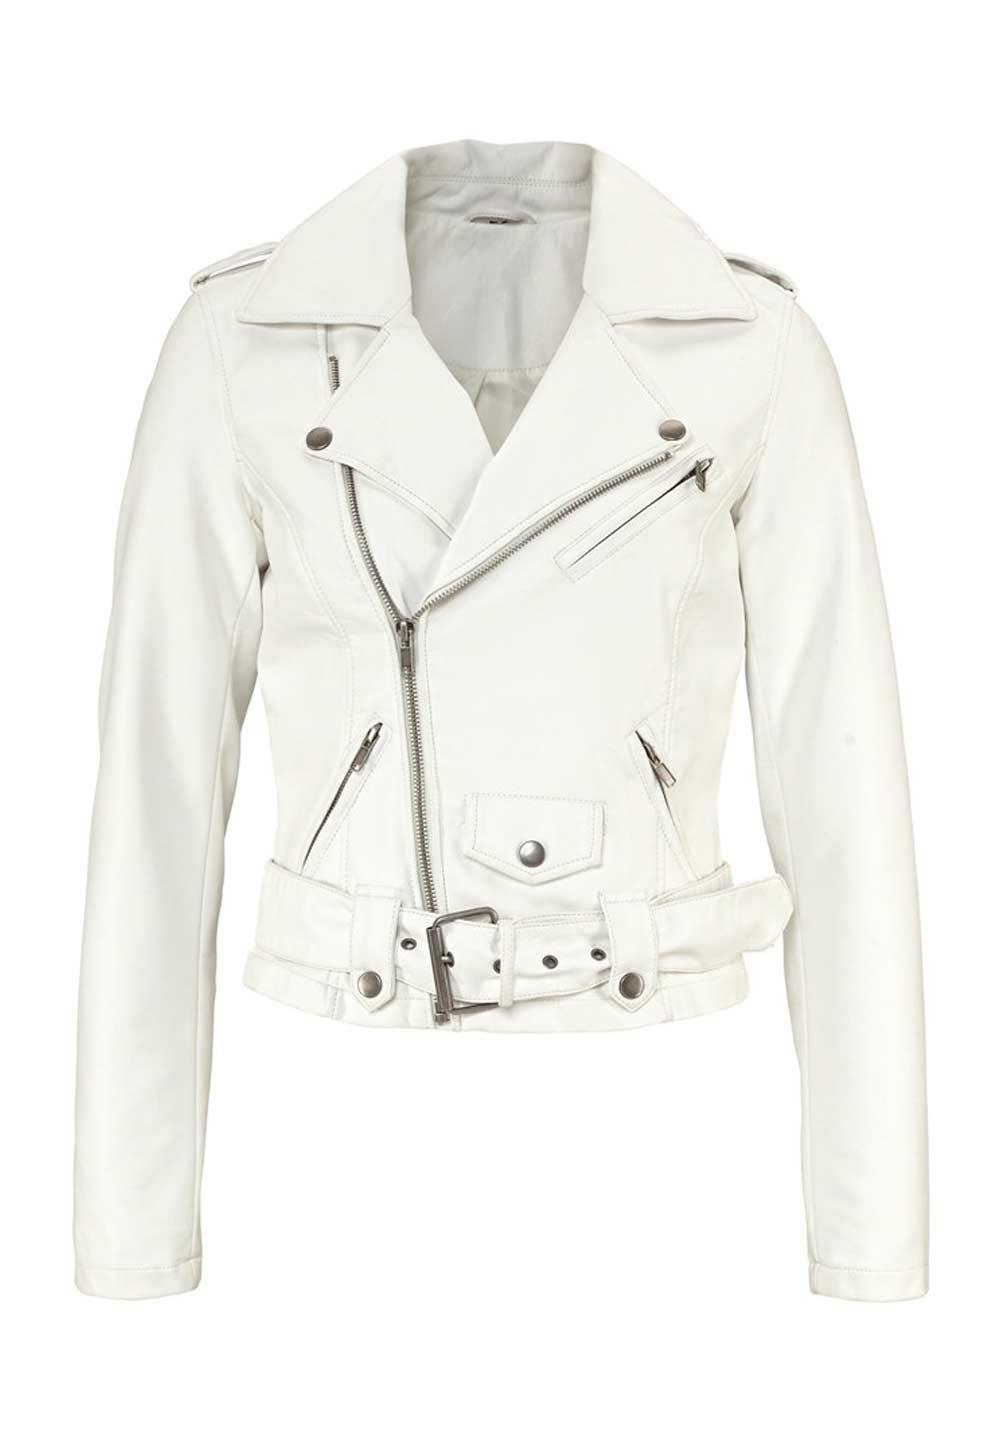 Dámská bílá bunda v motorkářském stylu (Laura Scott)